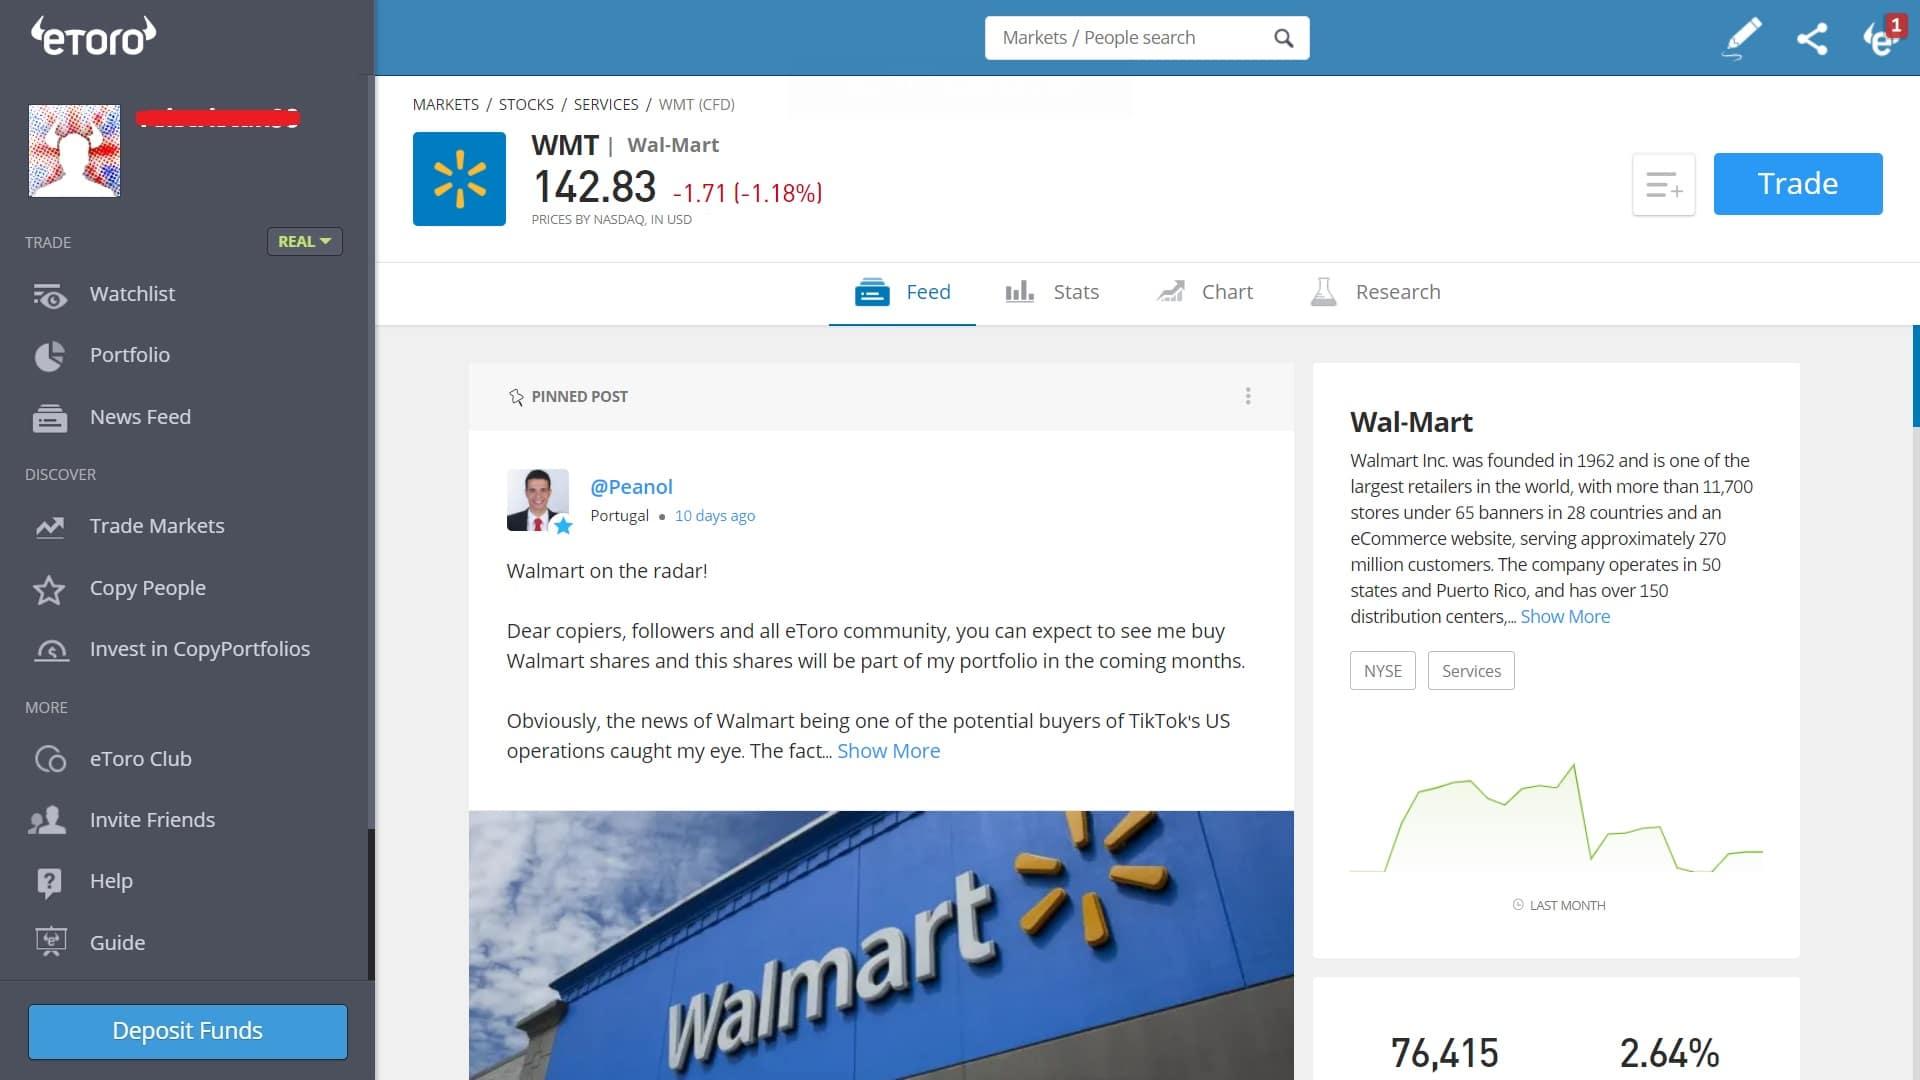 Walmart stock trading on eToro's platform